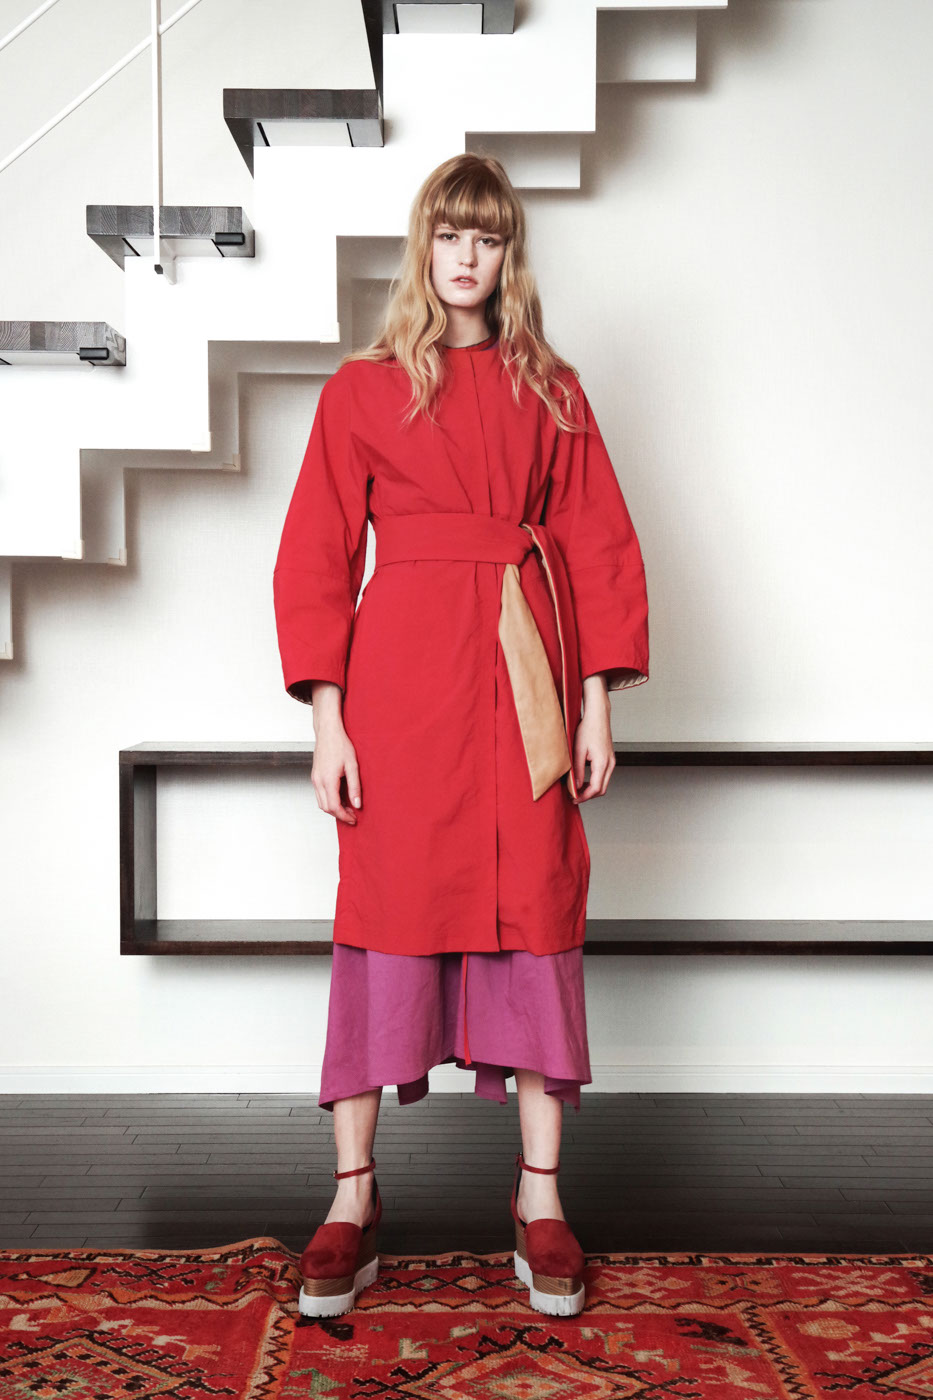 19016 Coat ¥42,000, 19022 Dress ¥34,000